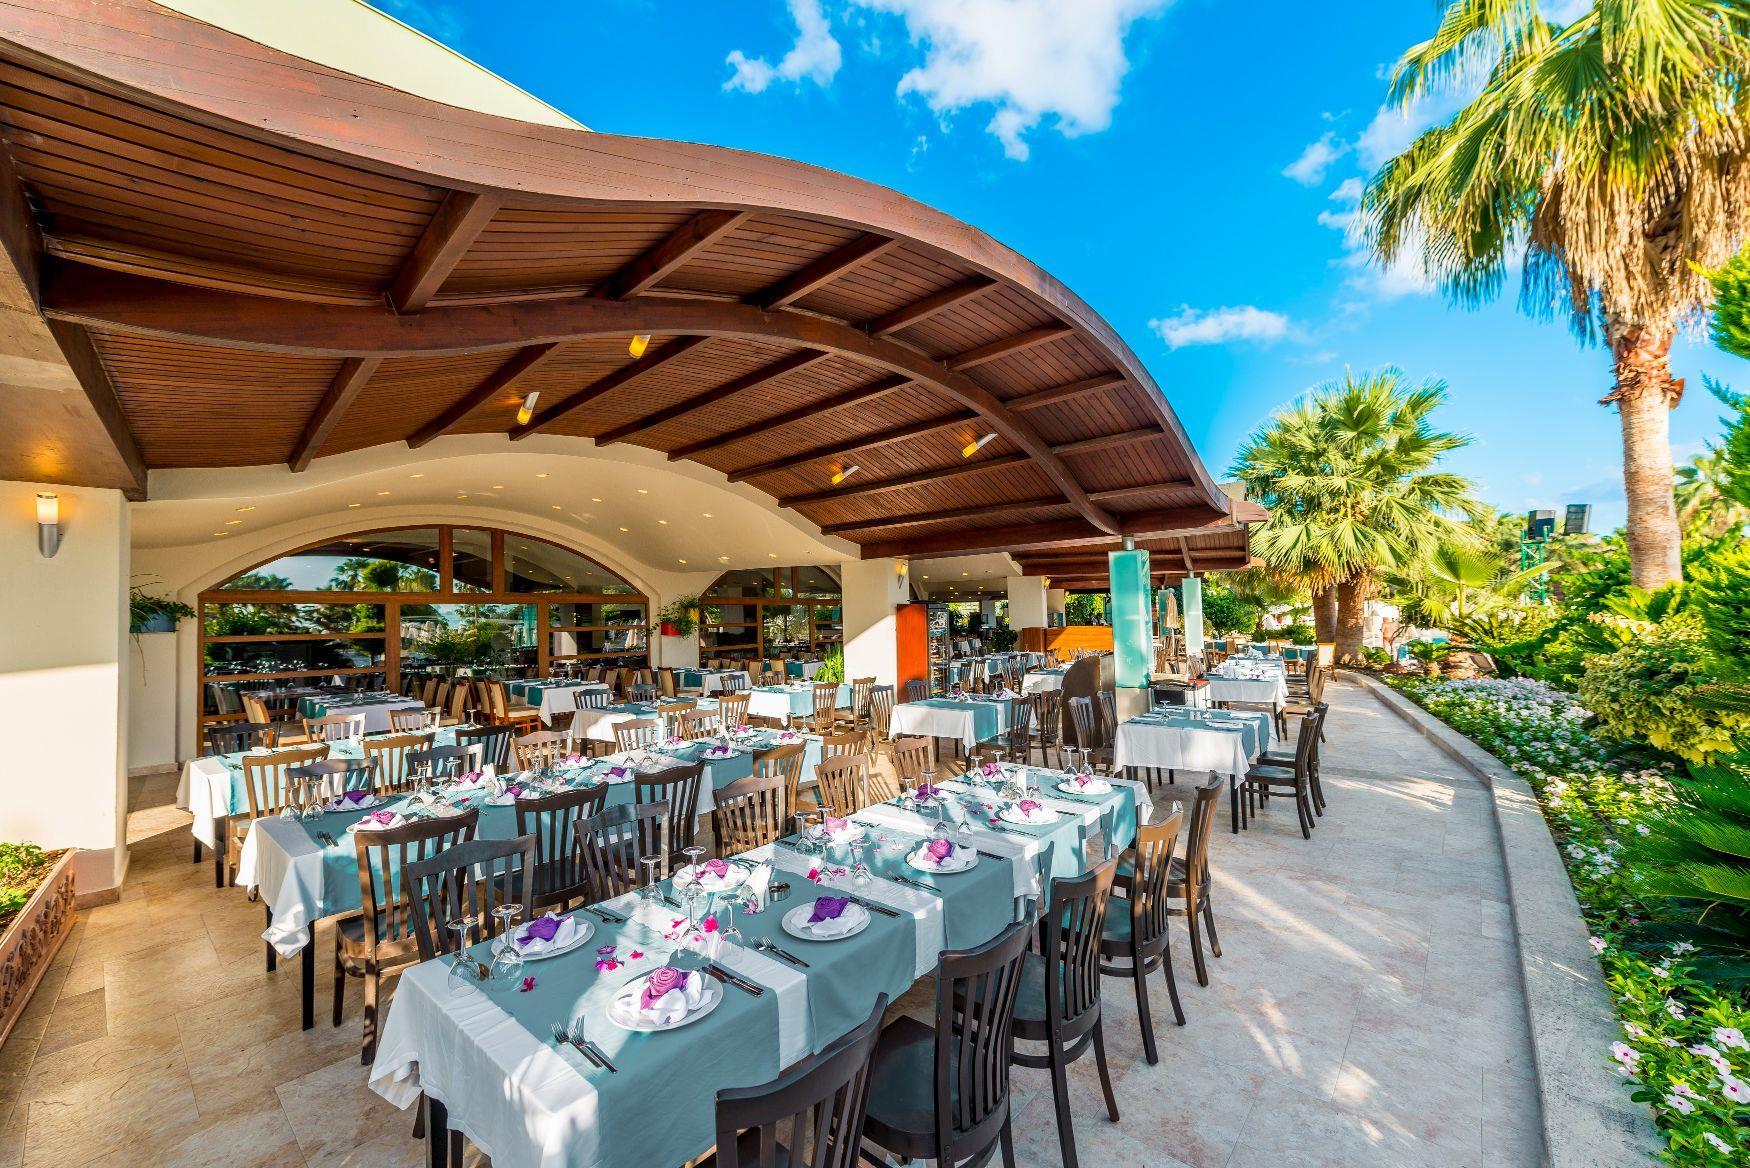 http://www.orextravel.sk/OREX/hotelphotos/vonresort-golden-coast-general-0032.jpg